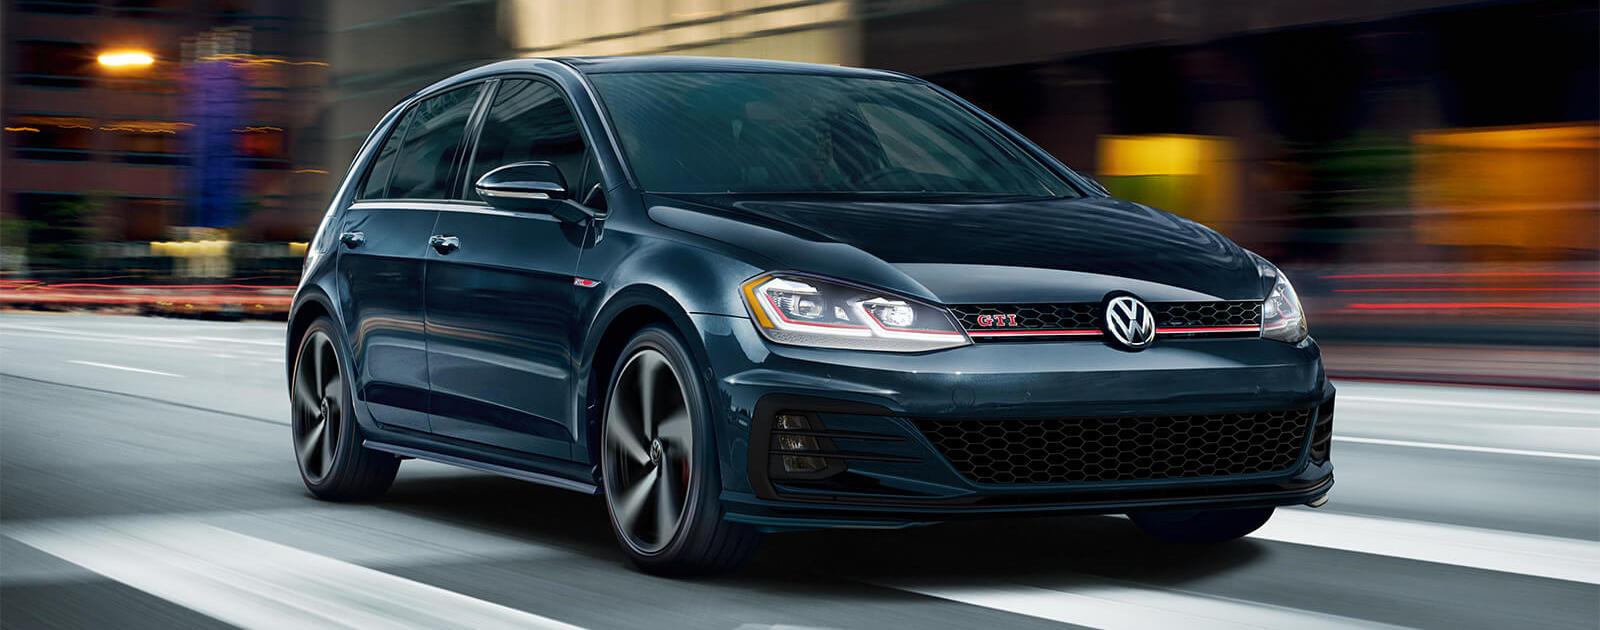 Volkswagen Golf GTI 2020 a la venta cerca de College Park, MD